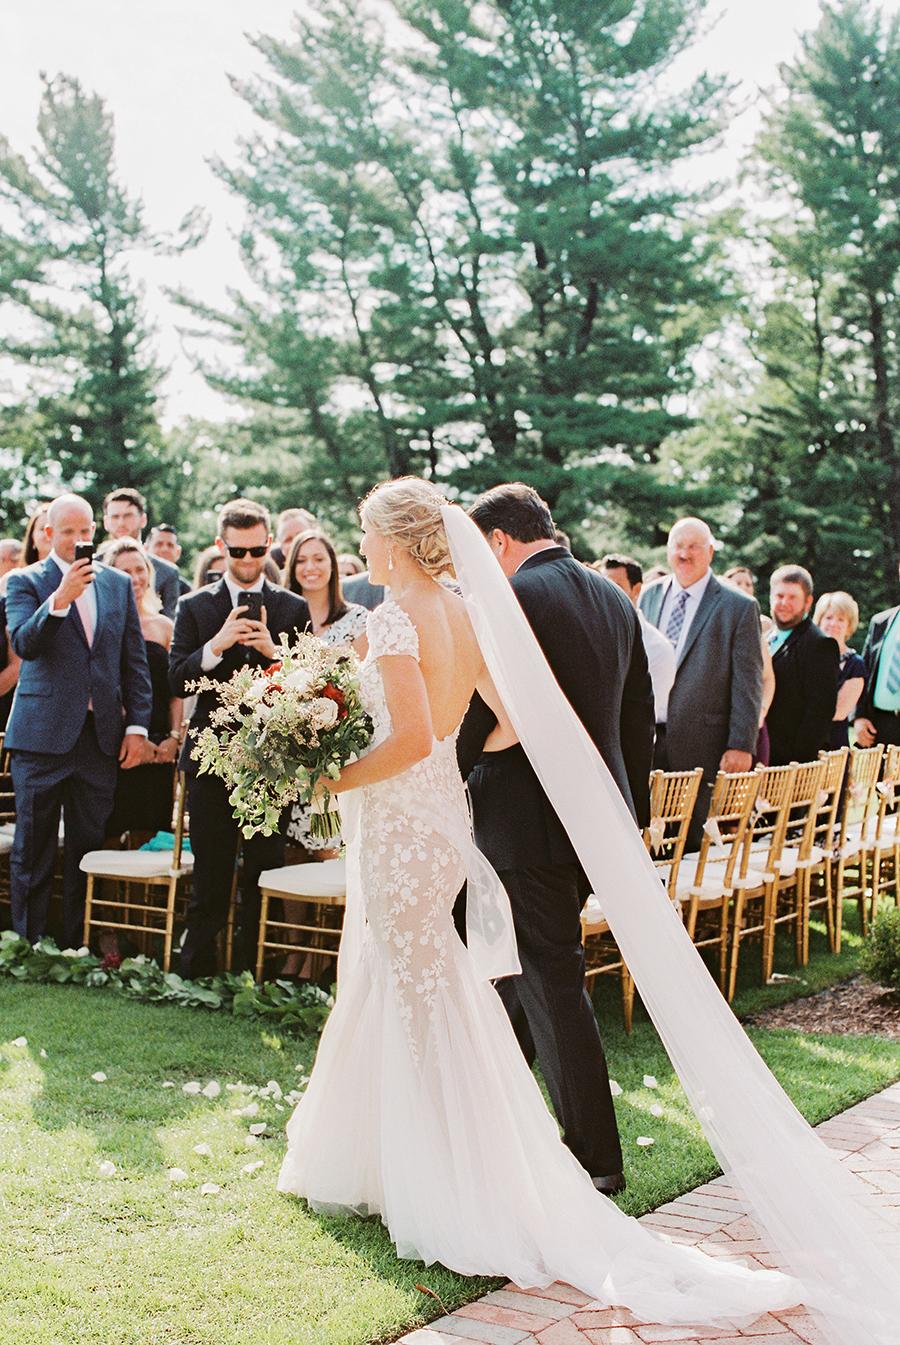 SALLY PINERA PHOTOGRAPHY_NJ WEDDING_KATE AND CHASE_01-109.jpg